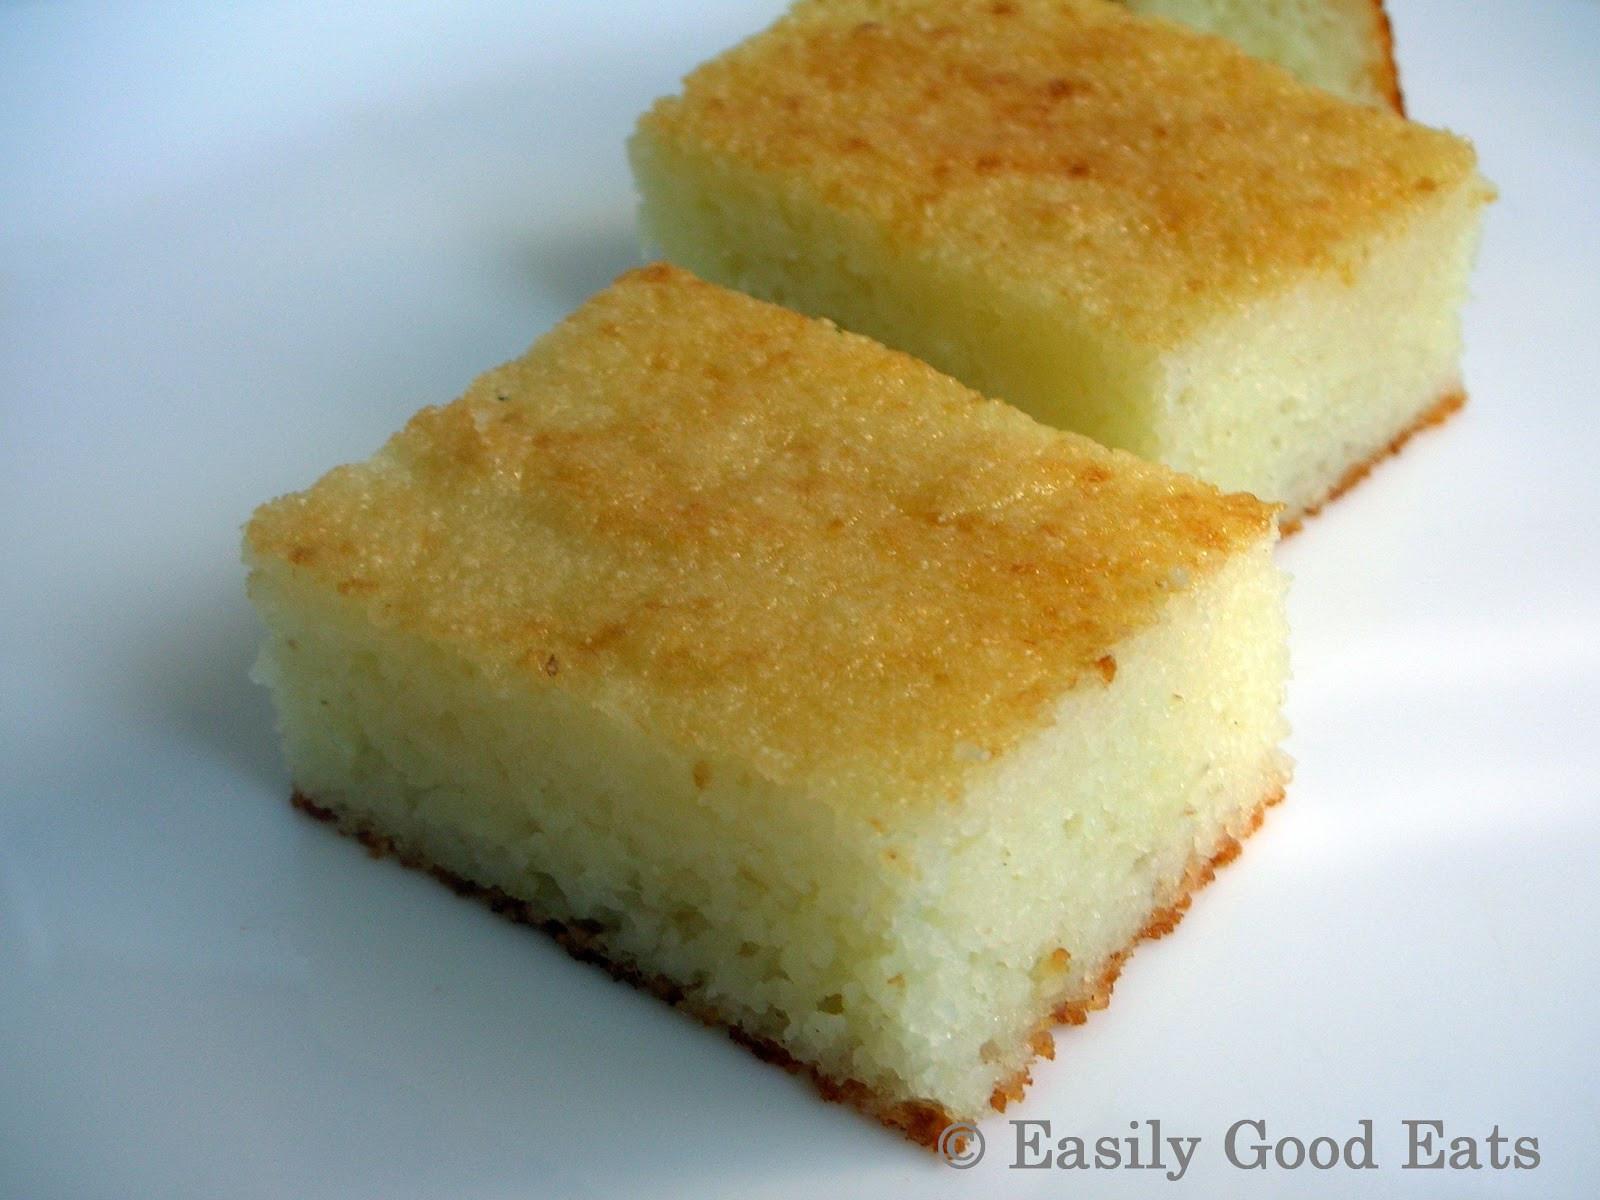 Yogurt Cake Recipe  Easily Good Eats Semolina Yogurt Cake Recipe